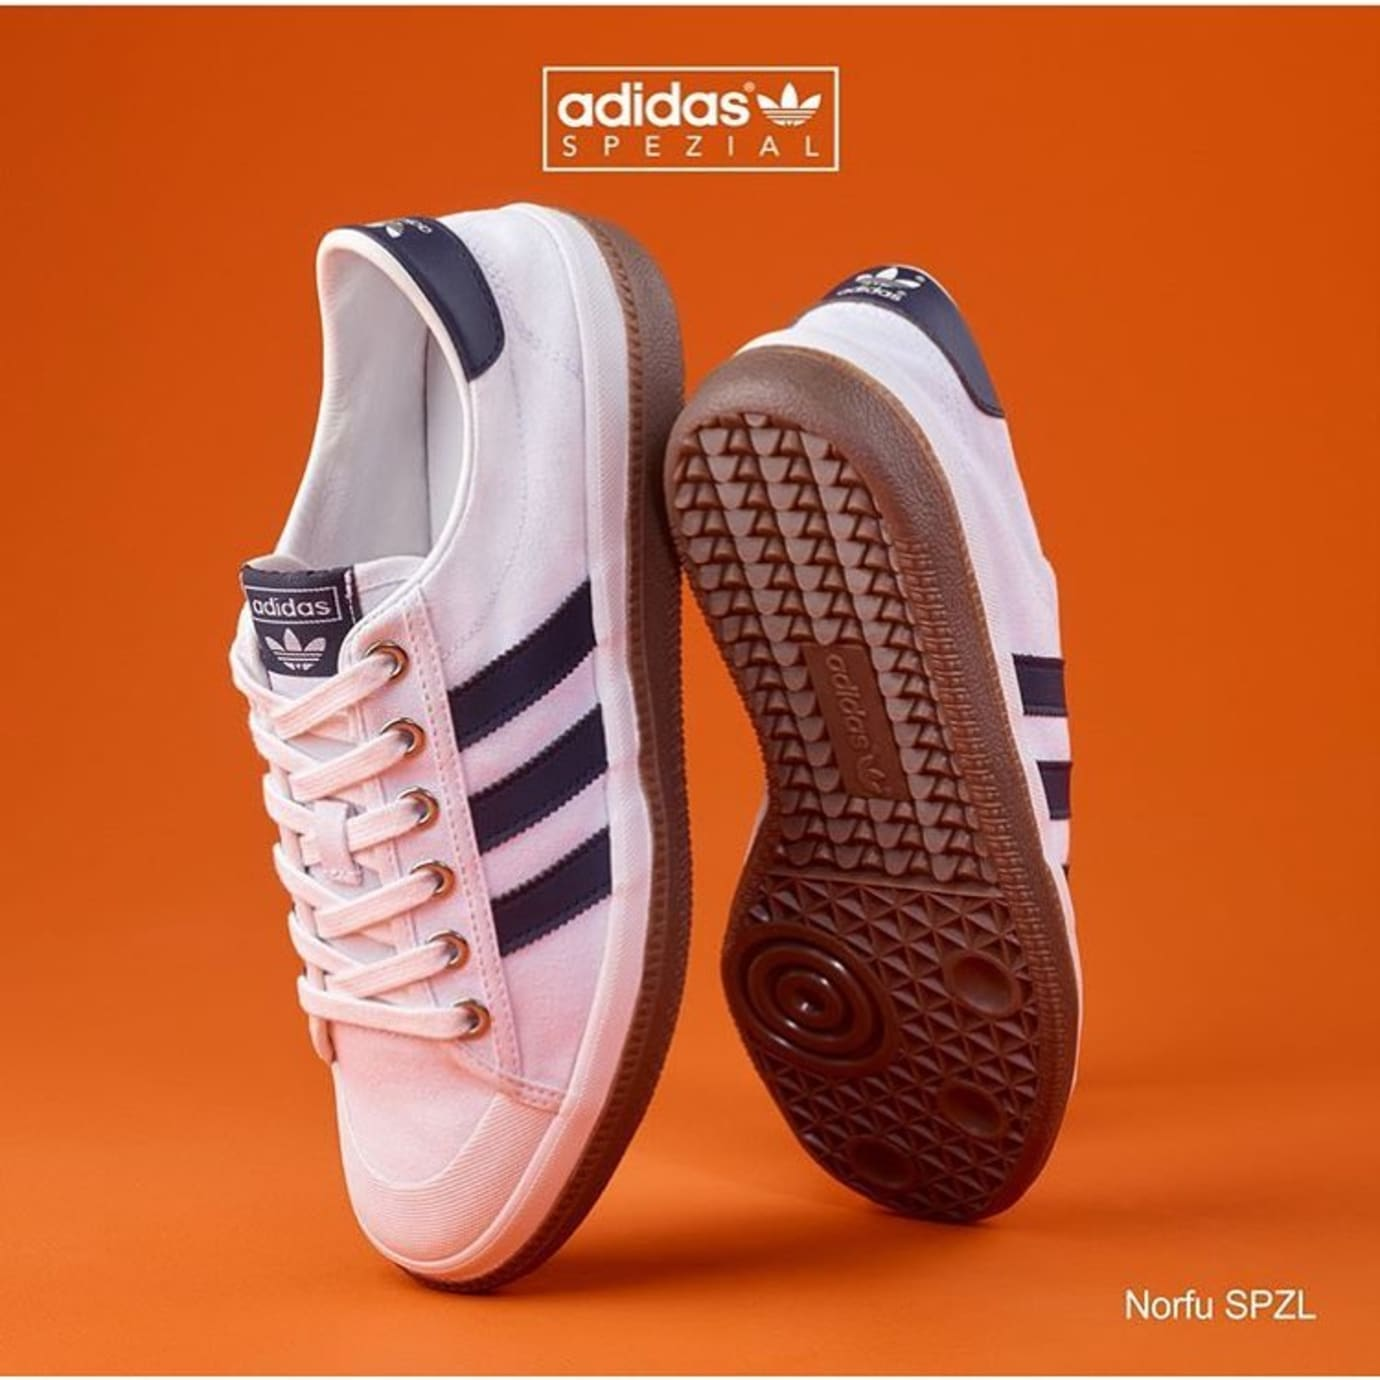 Adidas Spezial Spring/Summer 2019 Norfu